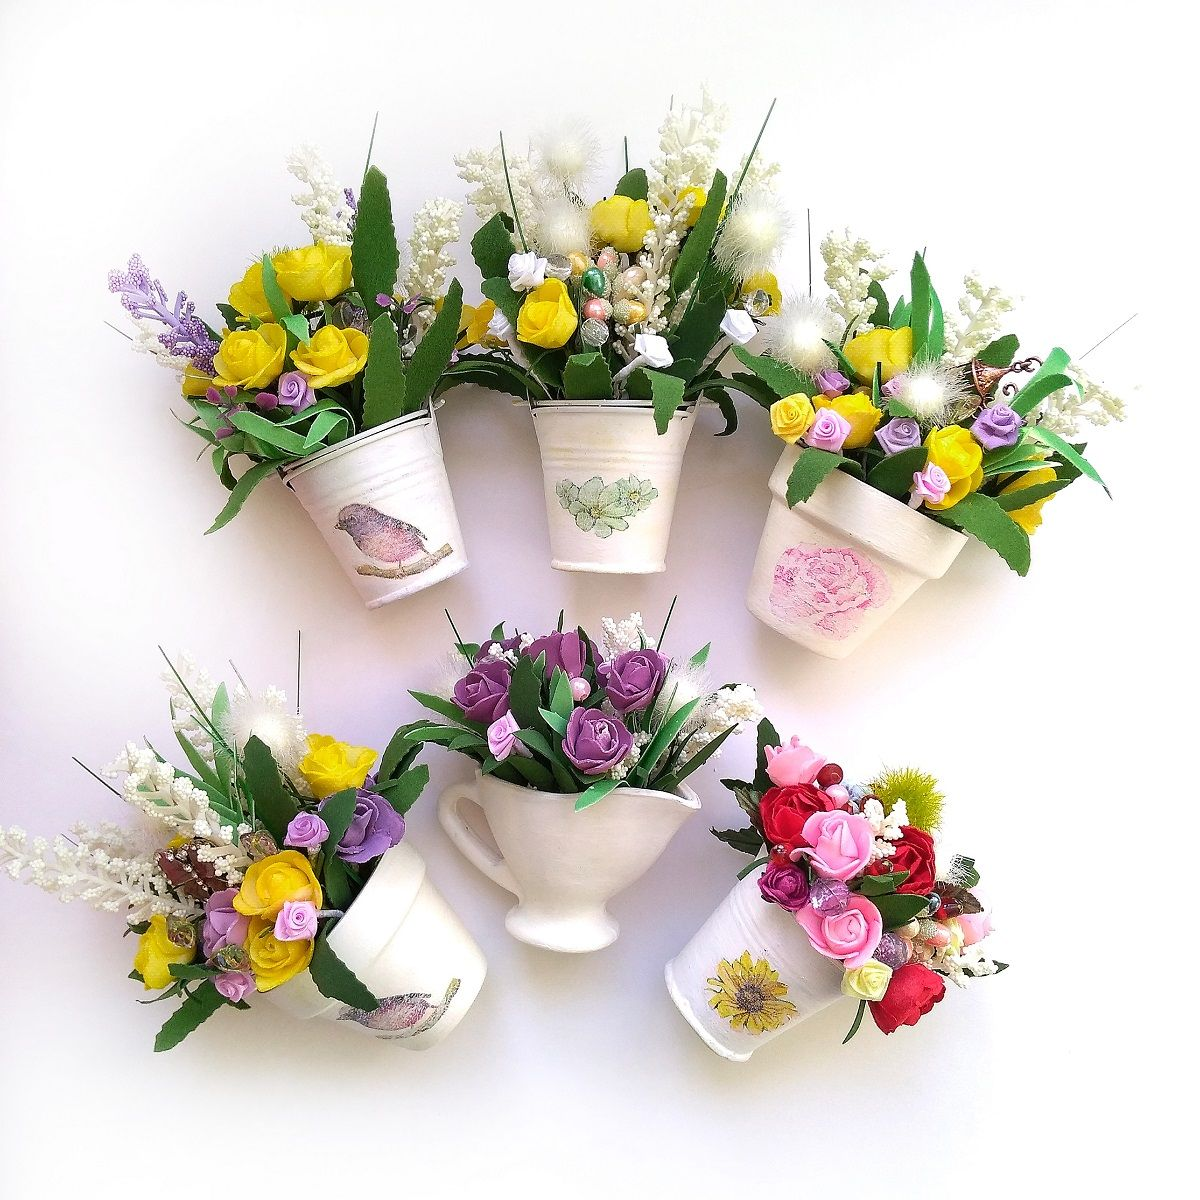 Flower Bouquet Flowers for Mom Felt Flowers Bouquet Felt Bouquet Mother/'s Day Gift Bride Bouquet